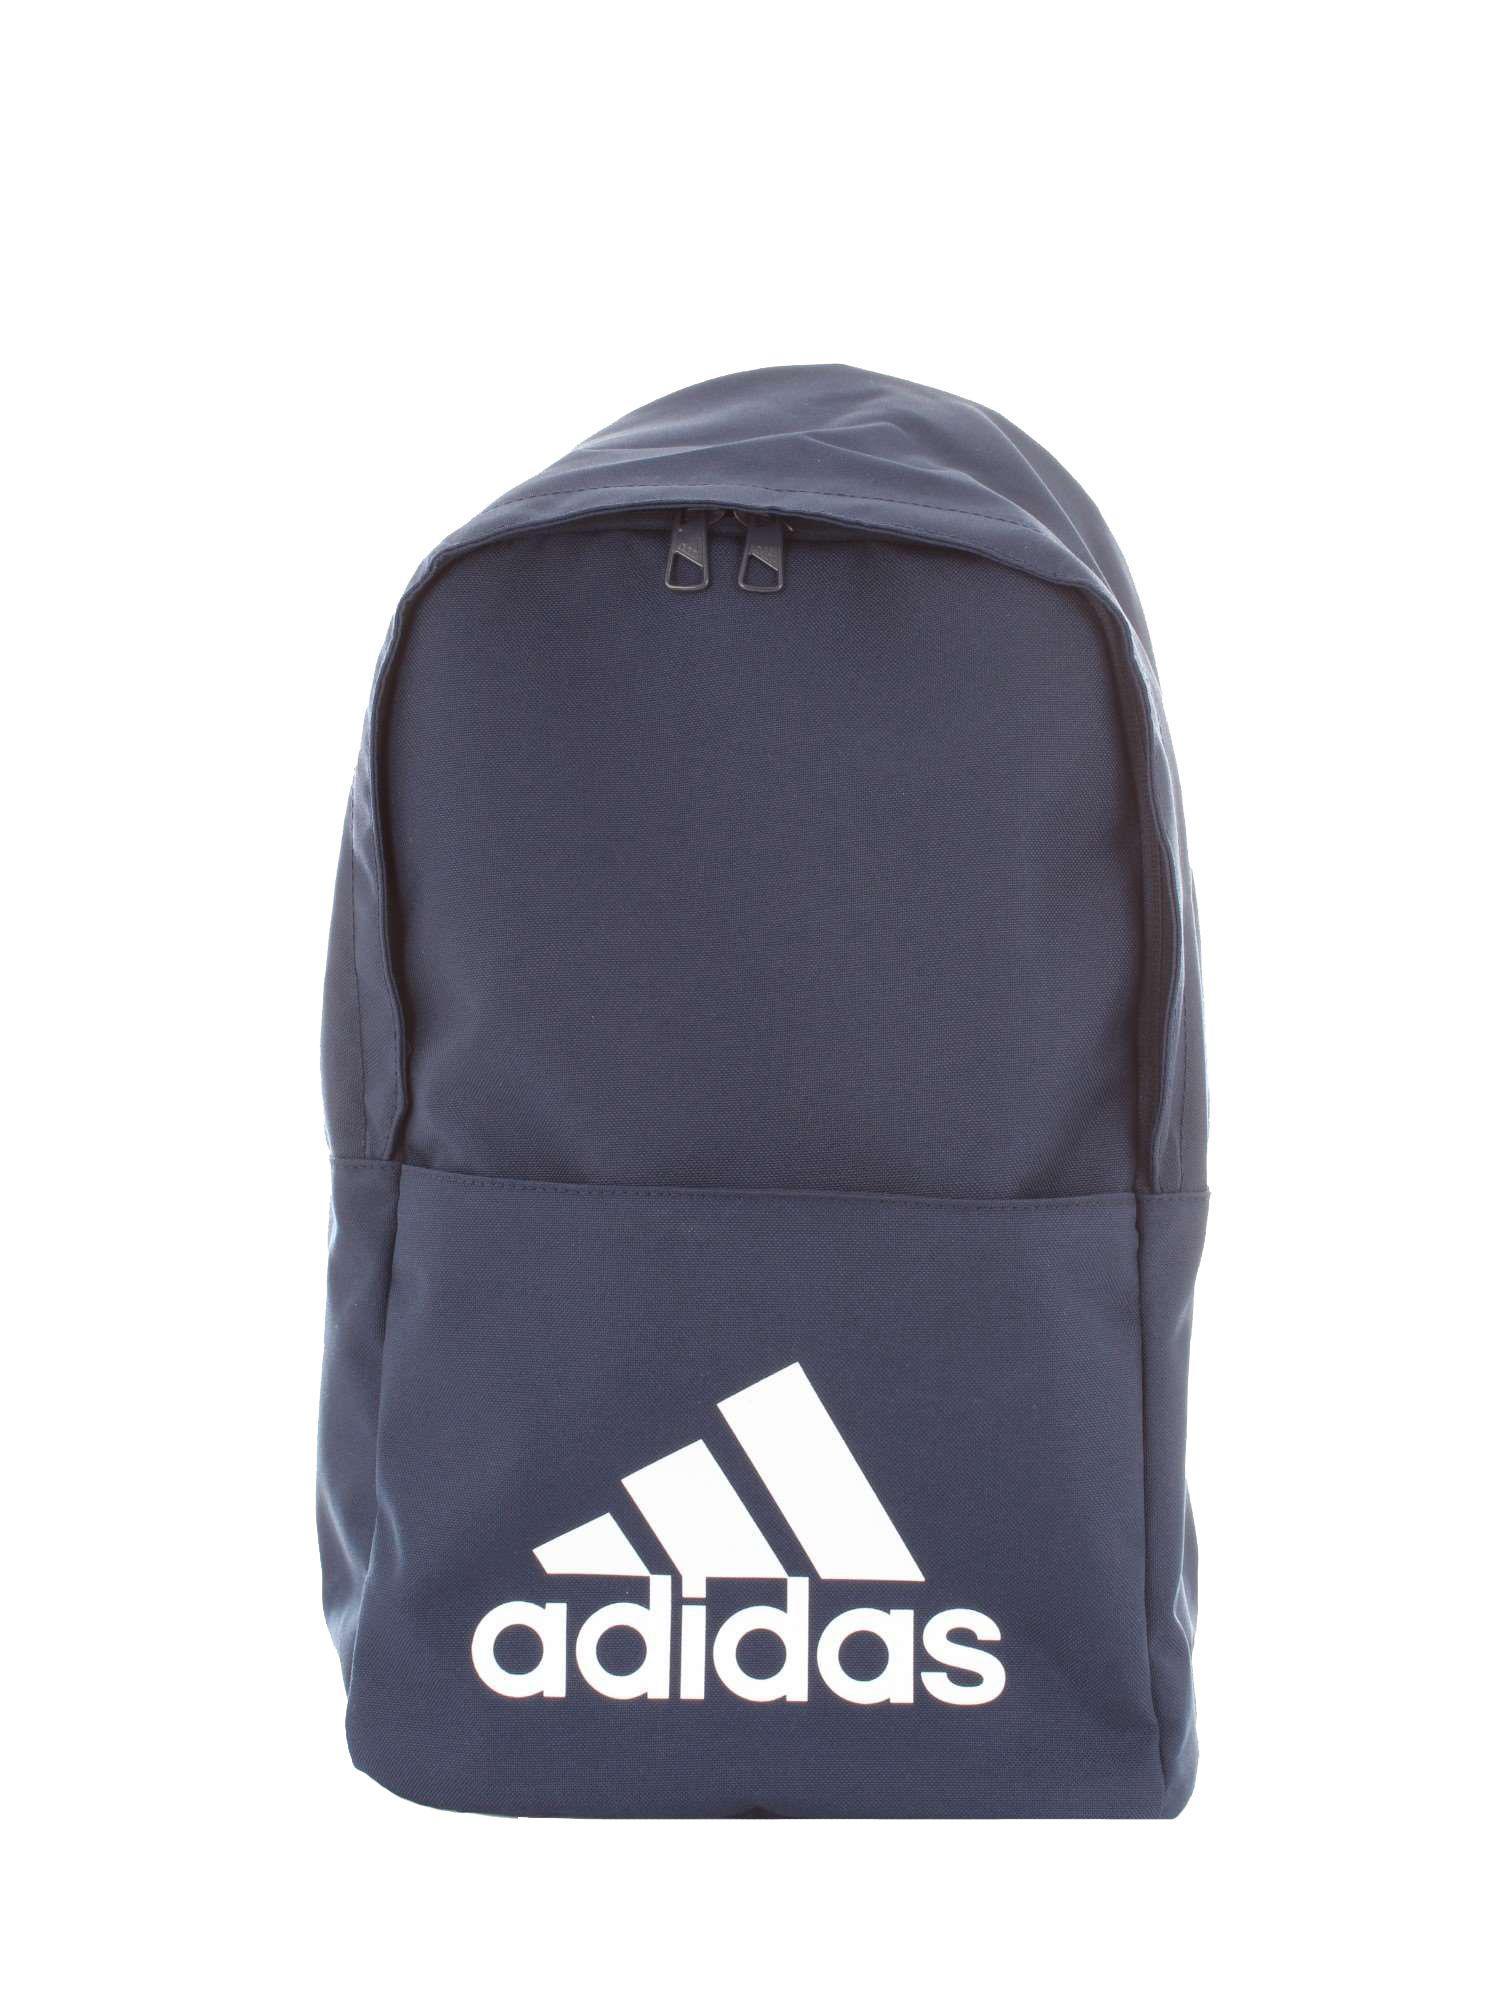 3085c183f96c Adidas - Men s Blue Polyester Backpack for Men - Lyst. View fullscreen